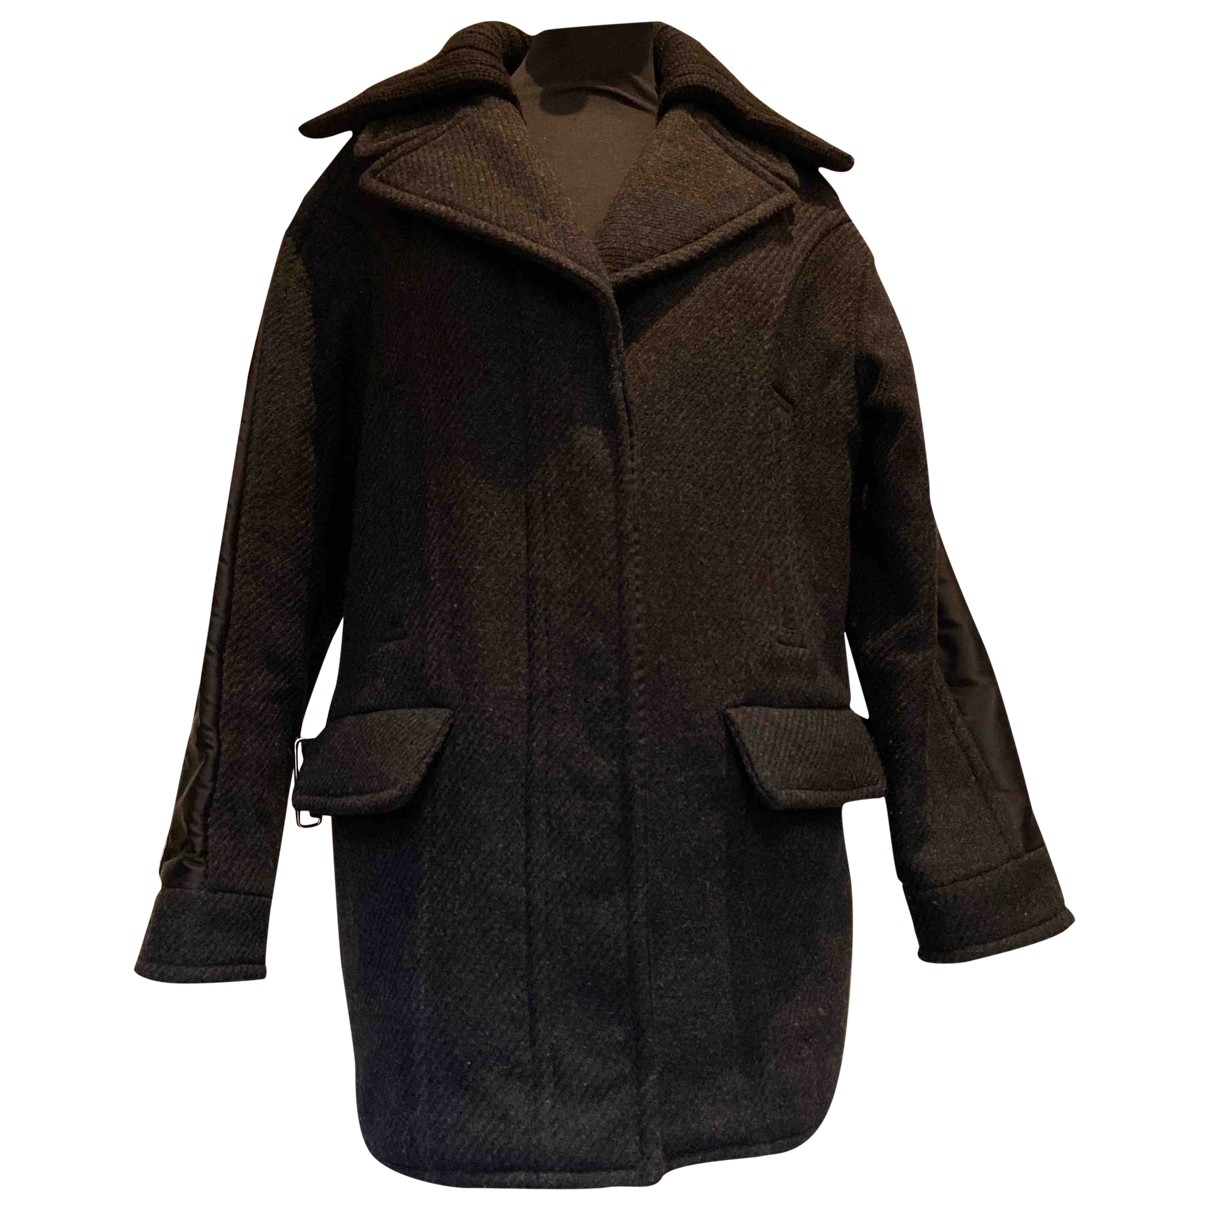 Prada \N Grey Wool jacket for Women 38 IT